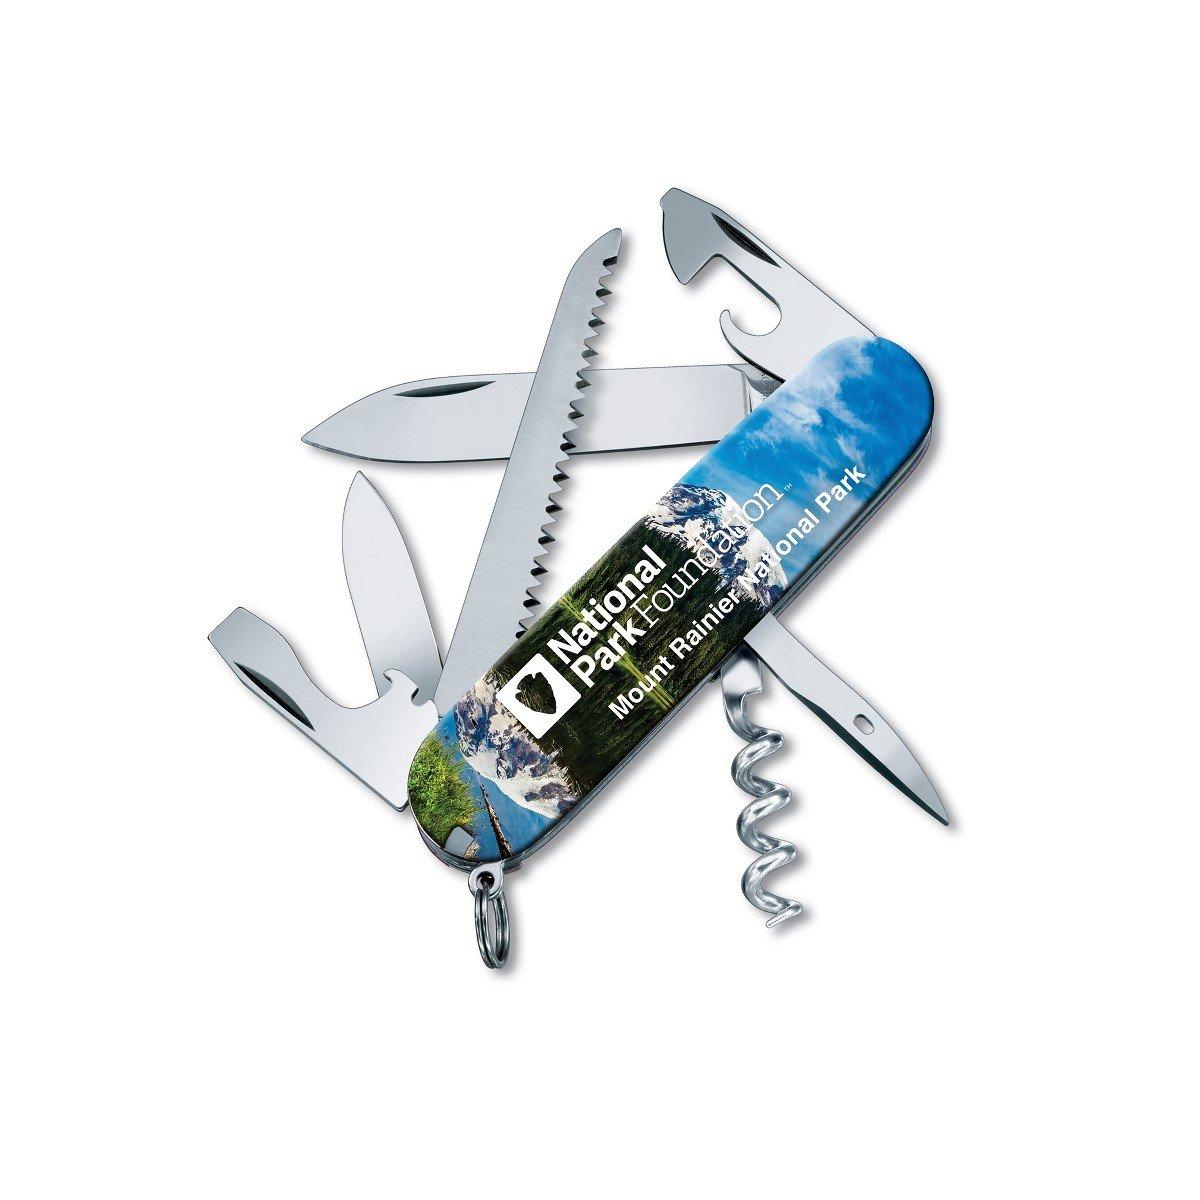 Victorinox Swiss Army Camper Pocket Knife, Mt. Rainier National Park by Victorinox